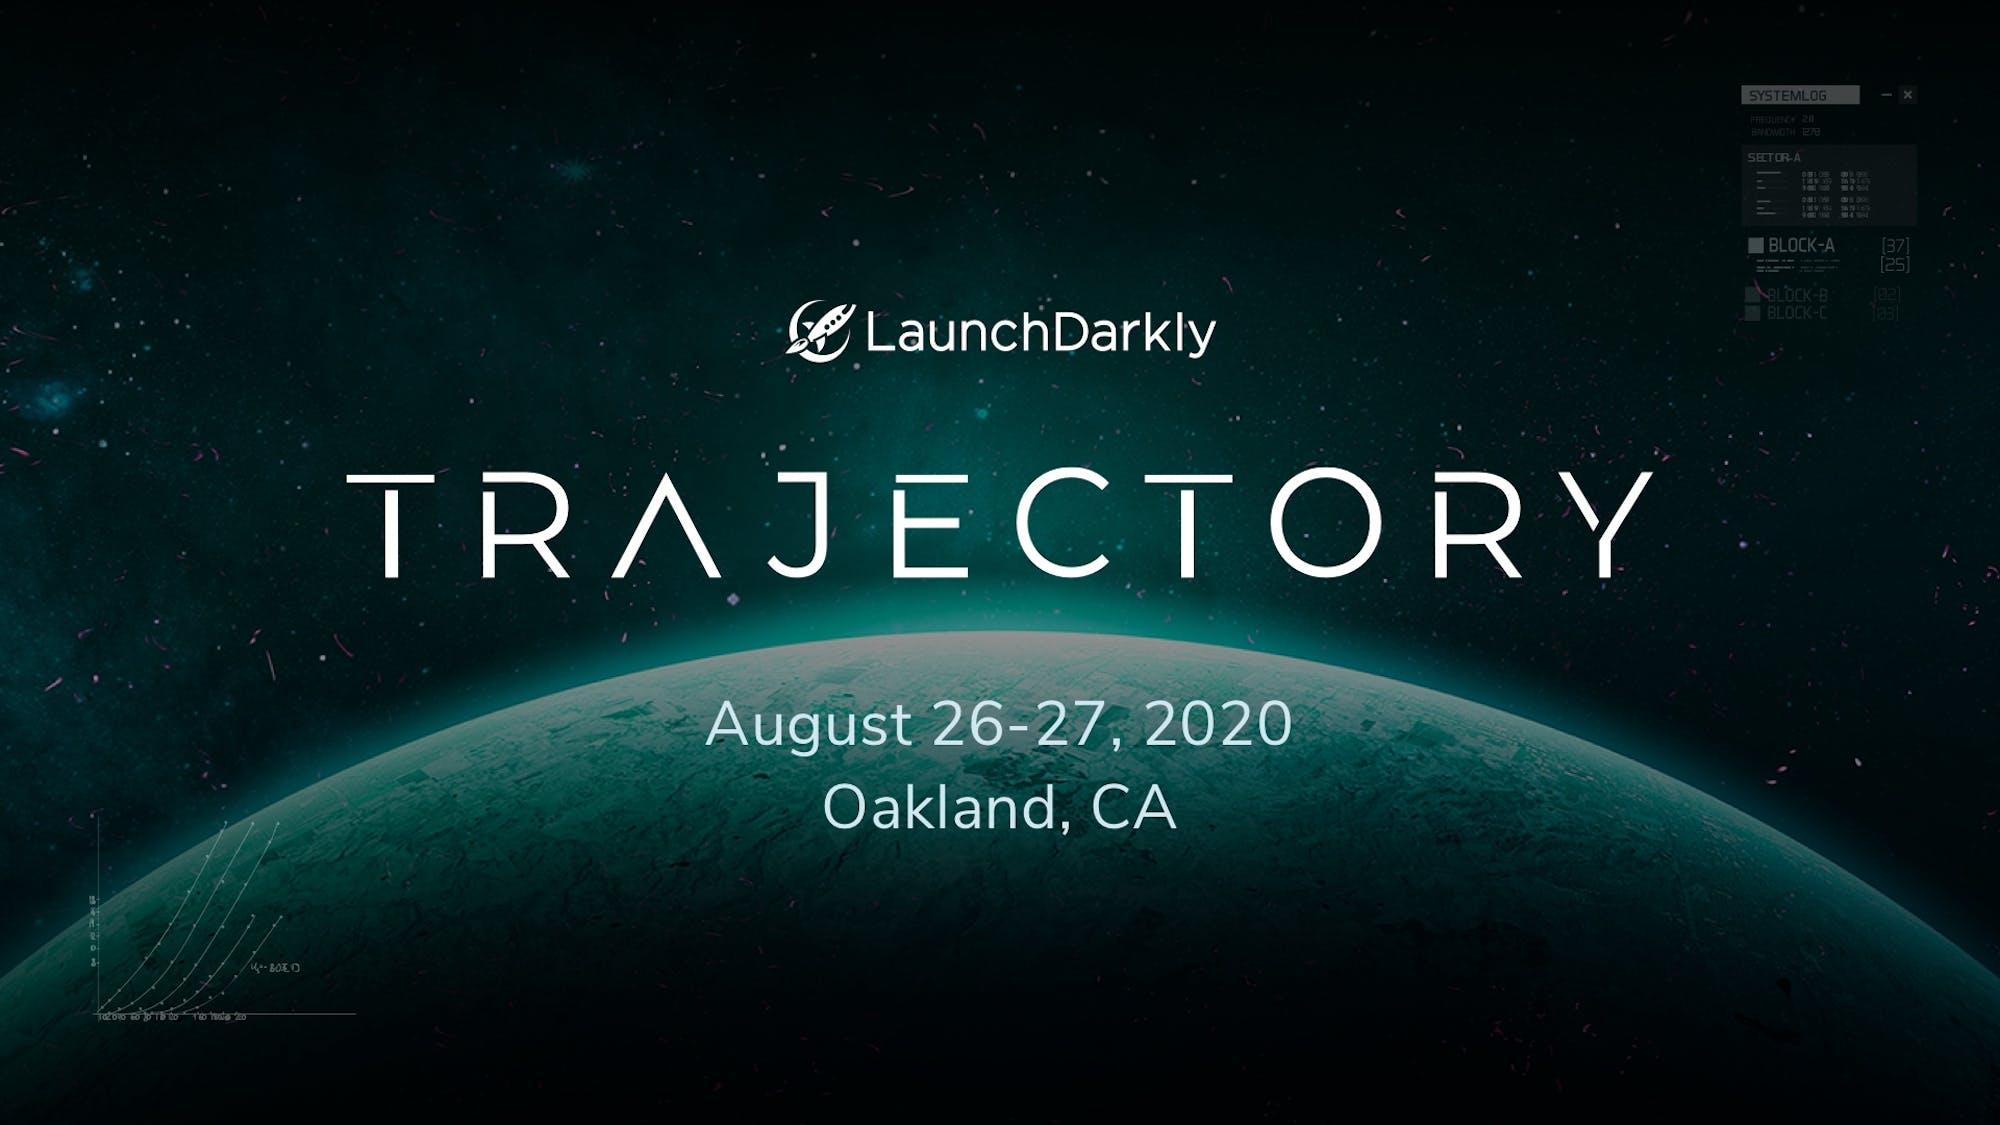 LaunchDarkly